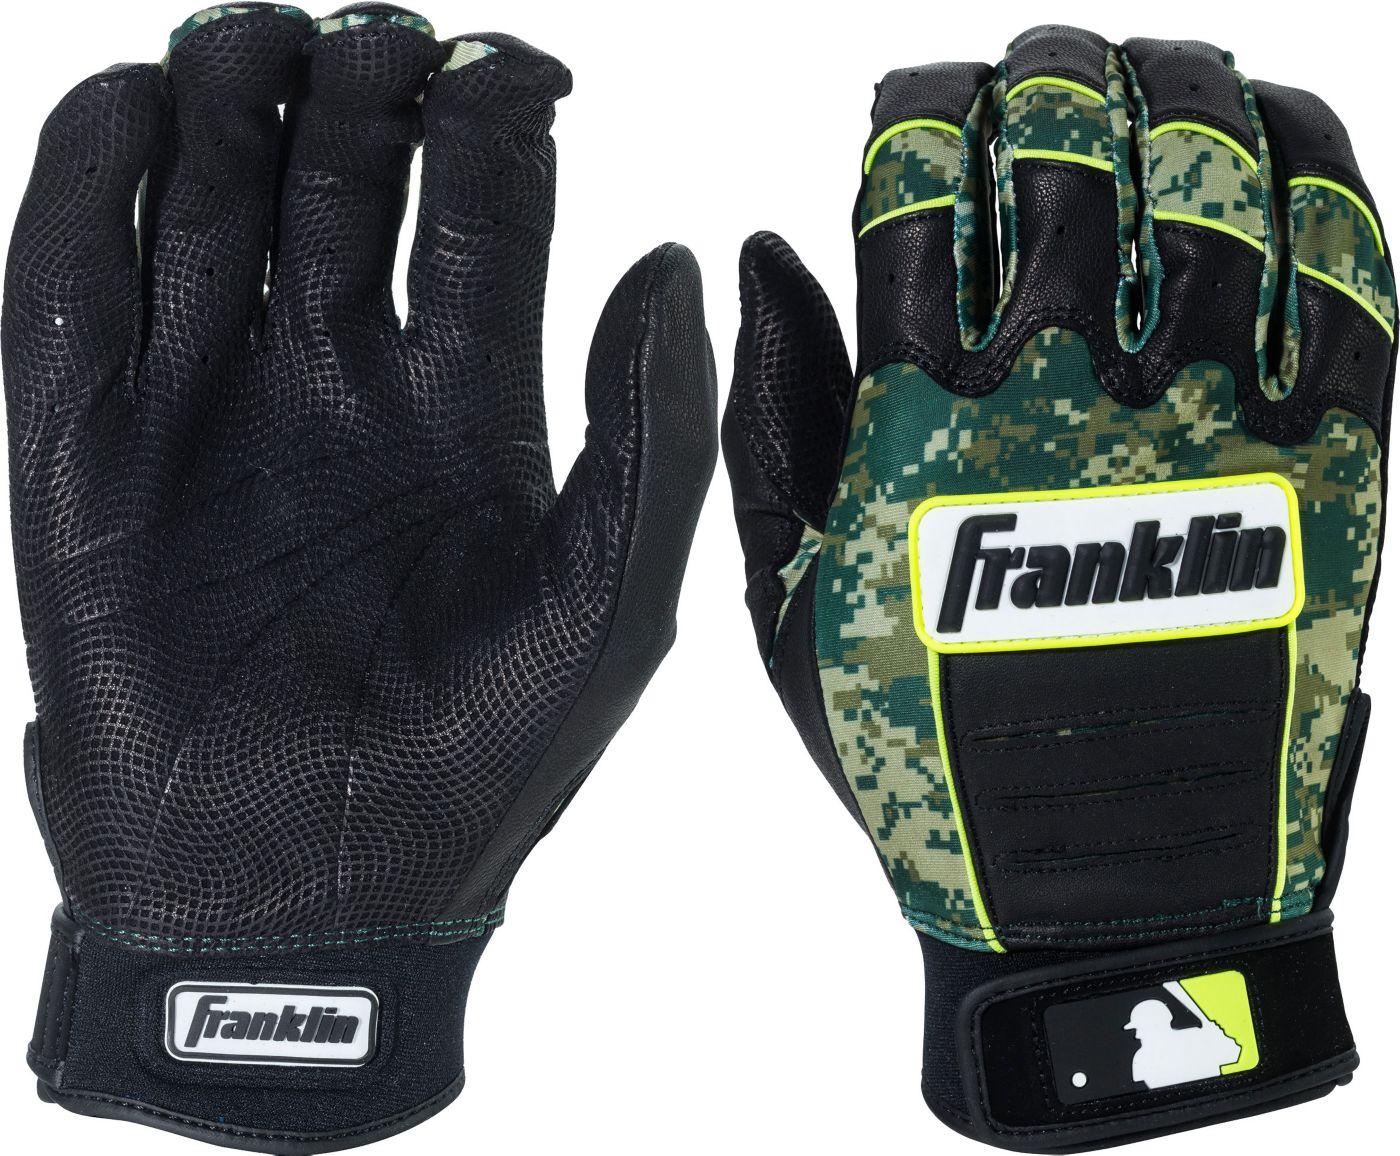 Franklin Youth CFX Pro Digi Series Batting Gloves